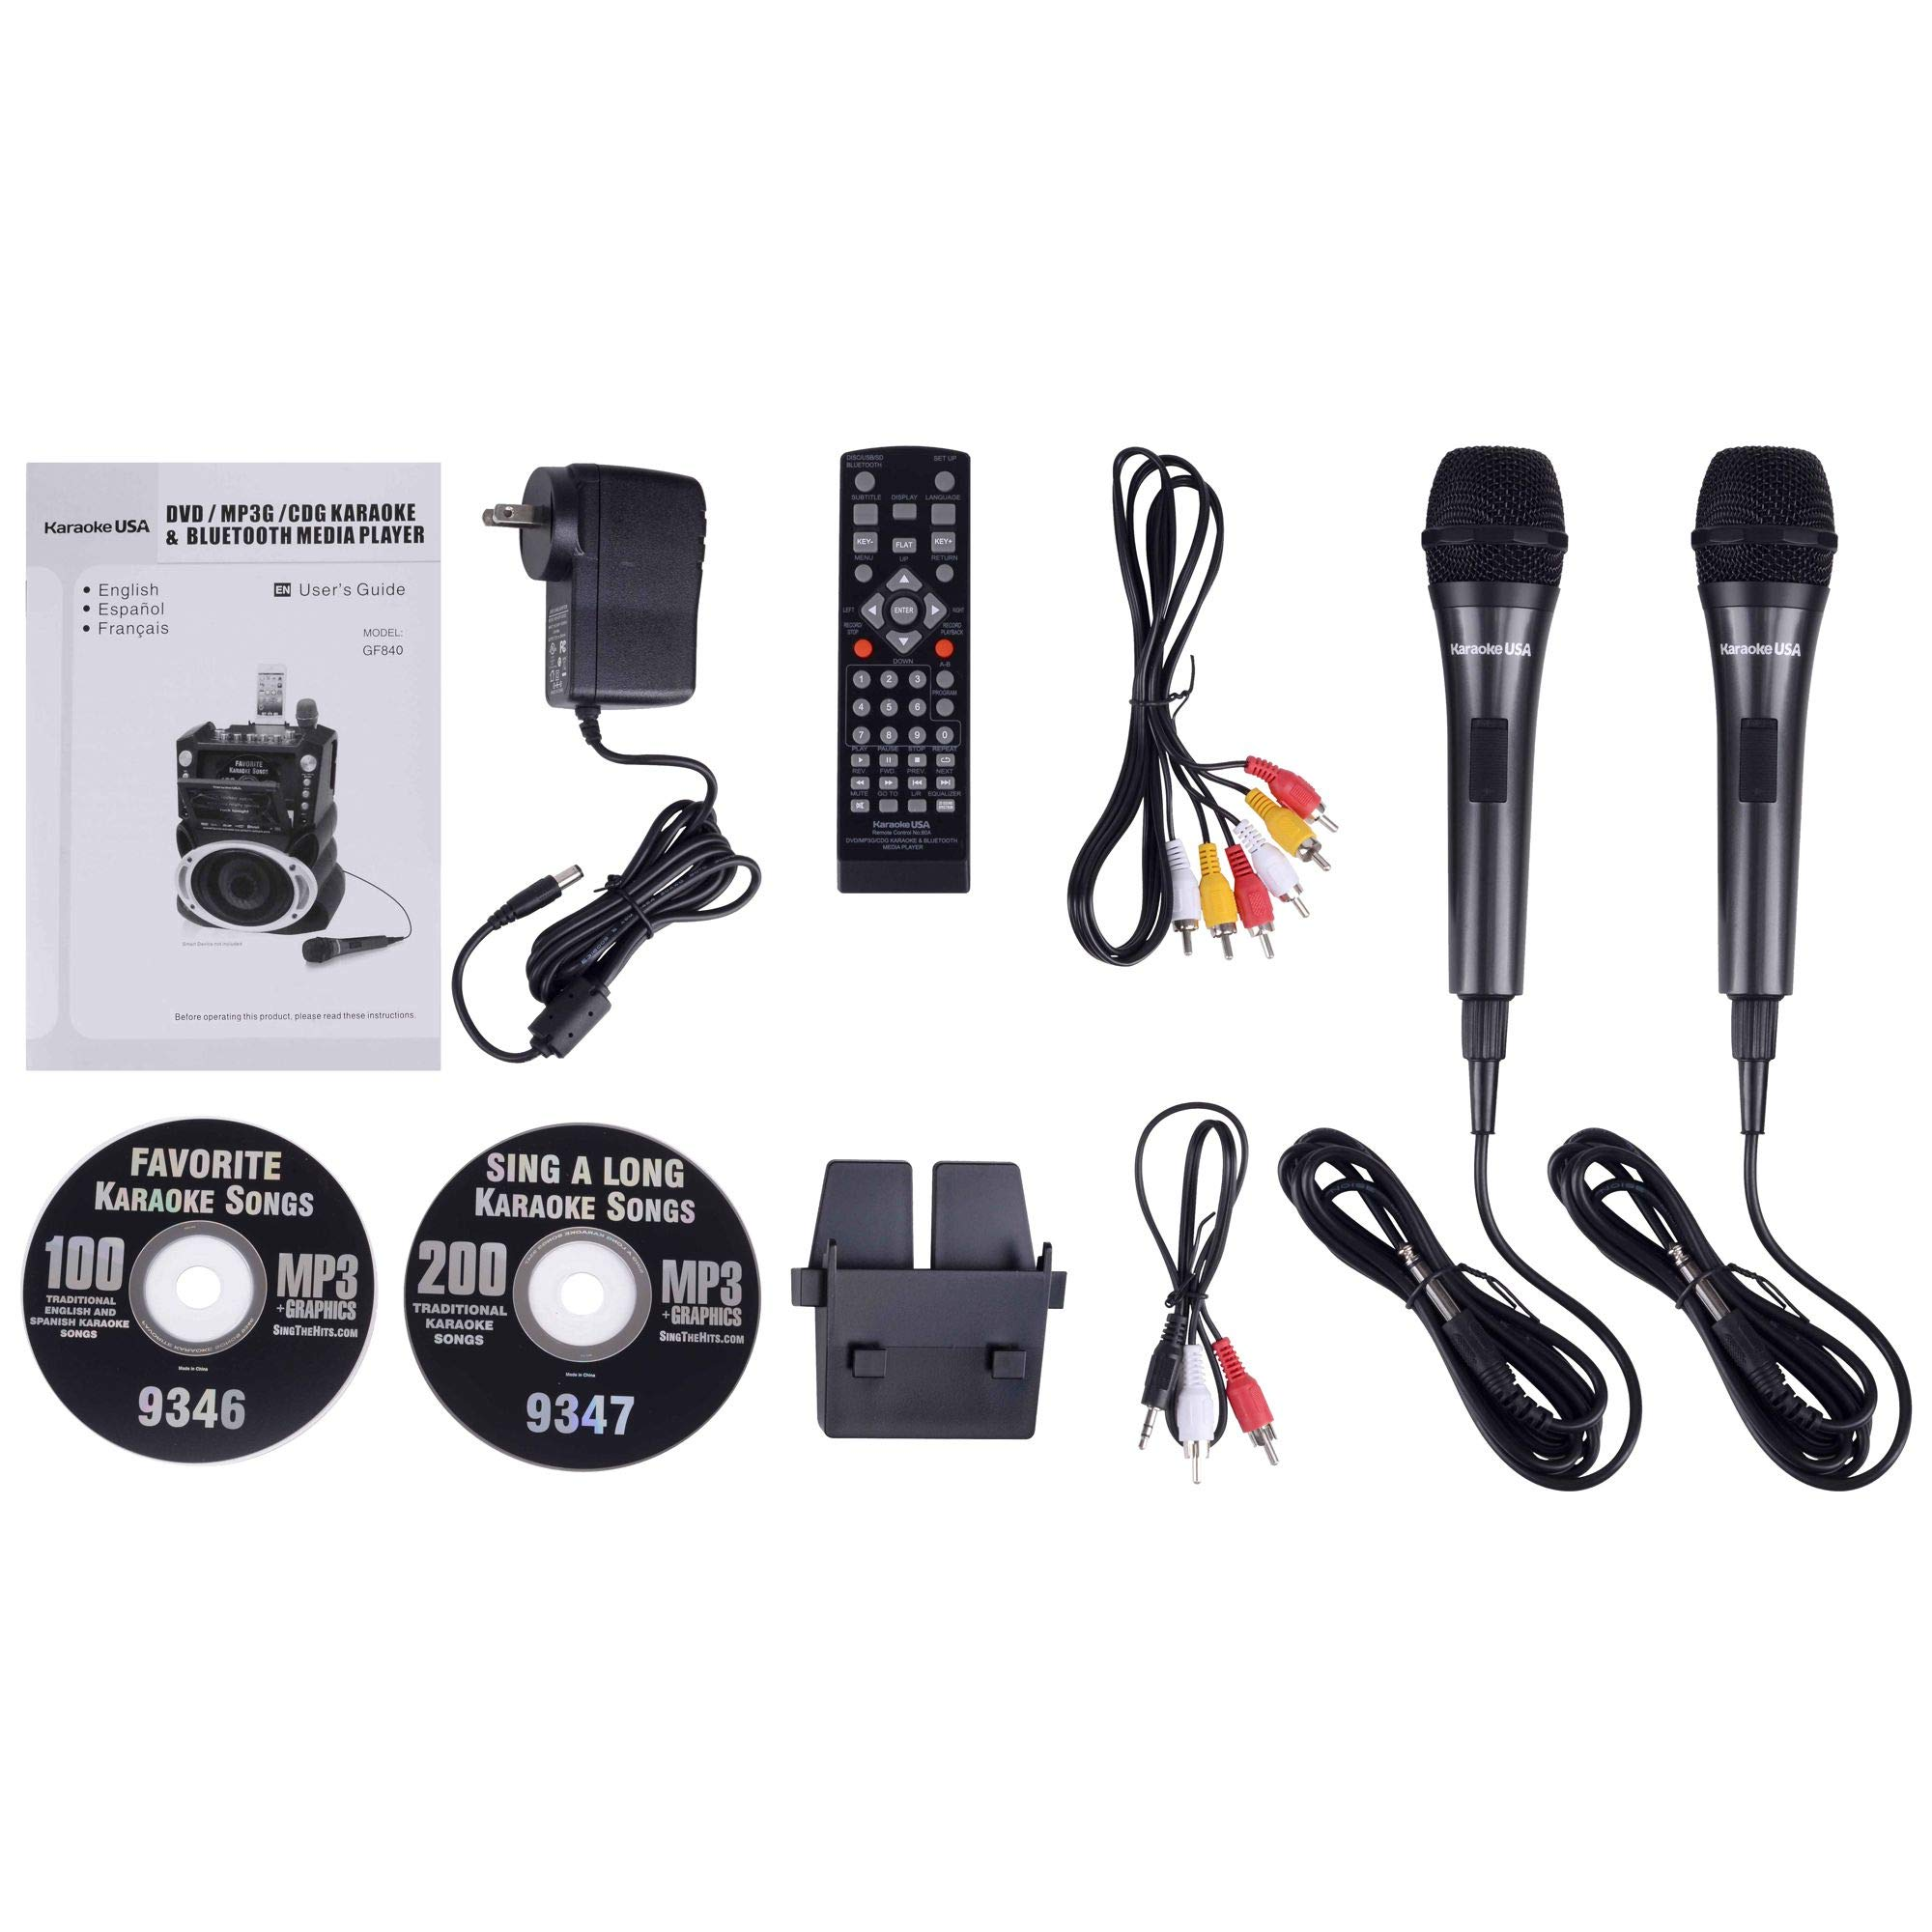 Karaoke USA GF846 DVD/CDG/MP3G Karaoke Machine with 7'' TFT Color Screen, Record, Bluetooth and LED Sync Lights by Karaoke USA (Image #13)